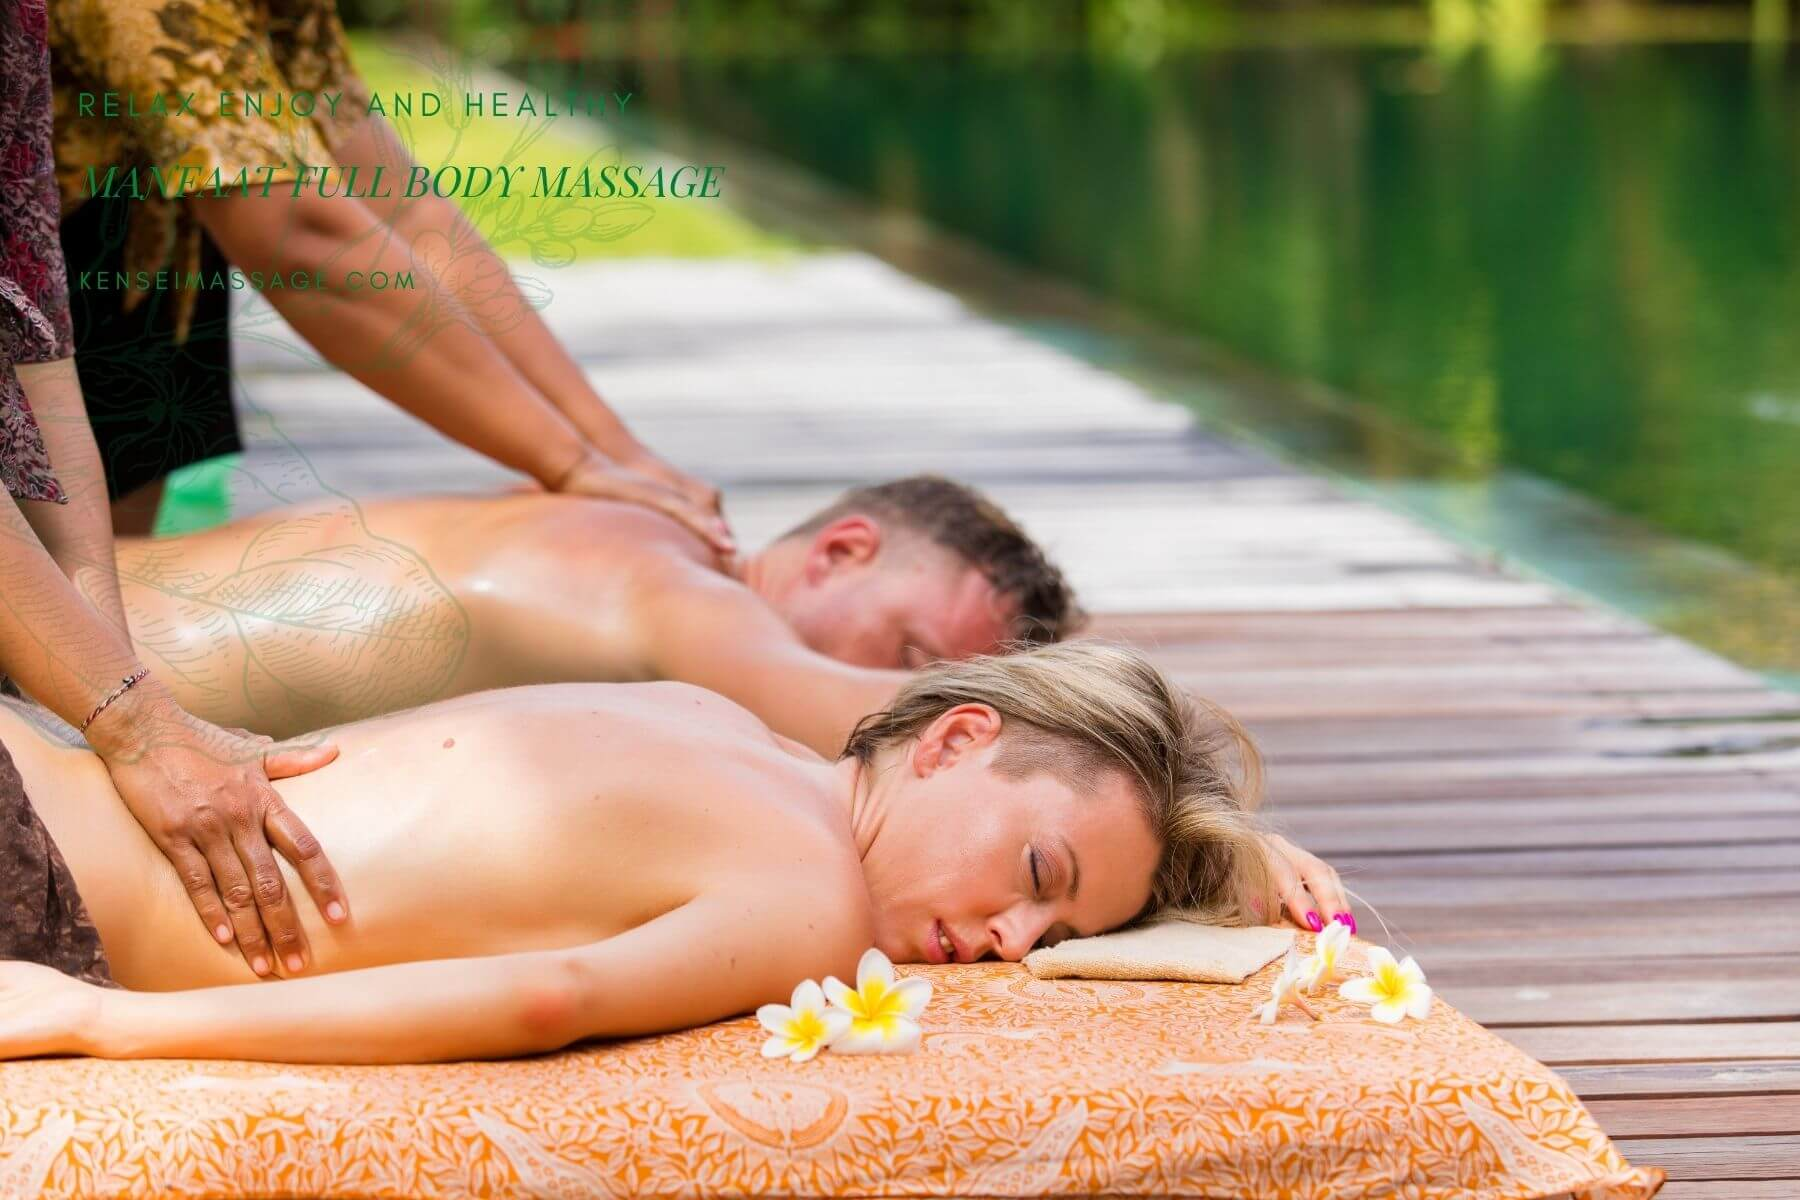 Manfaat Full Body Massage